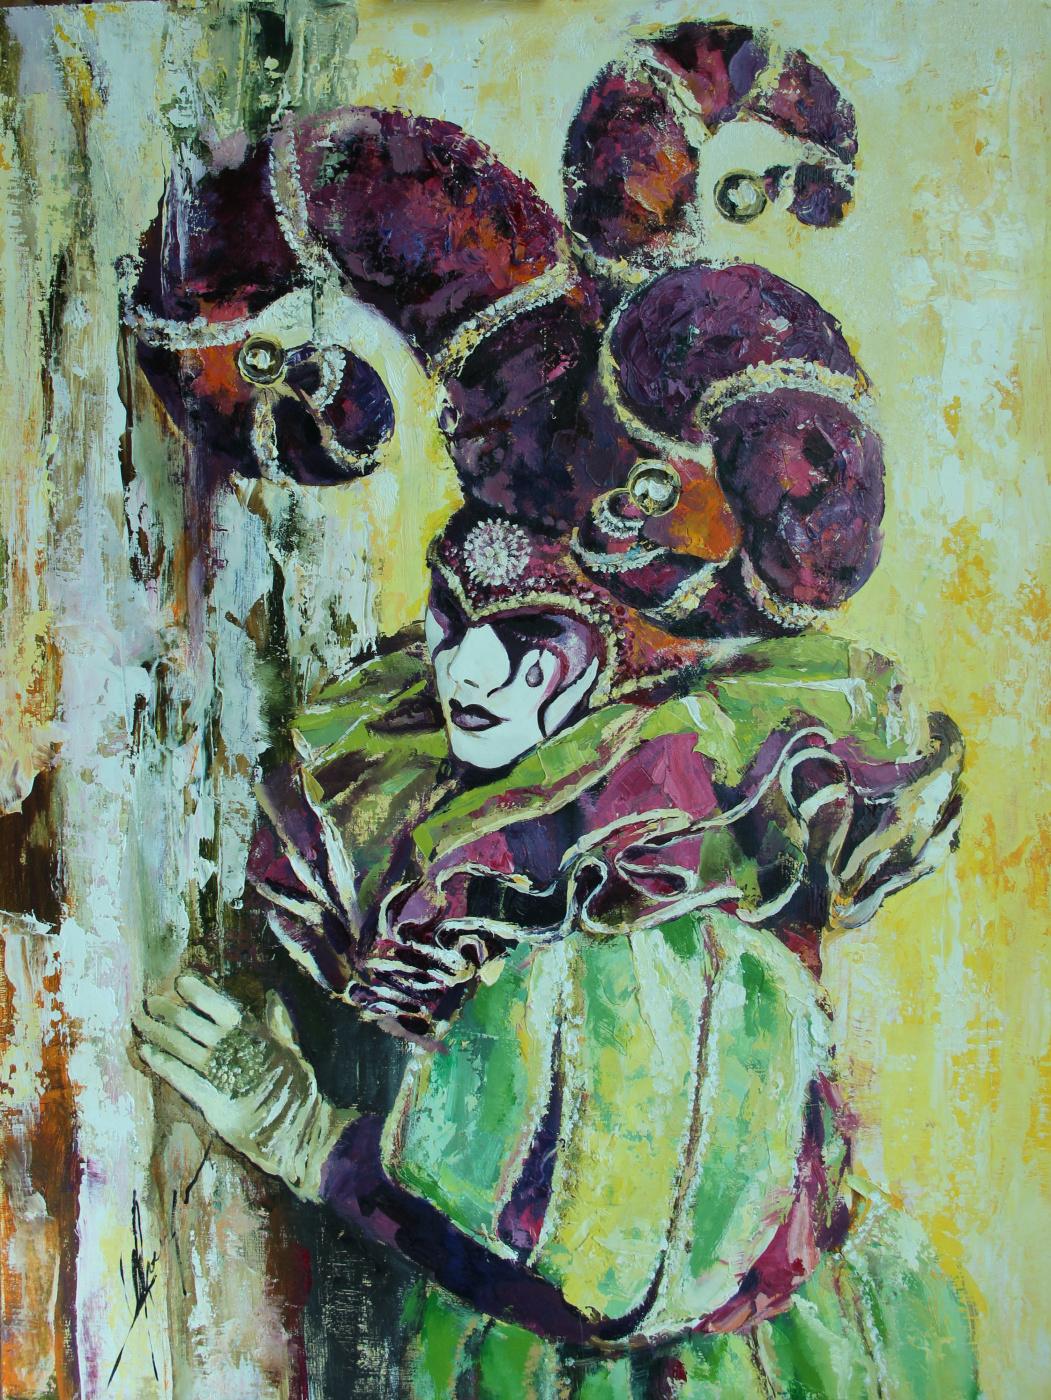 Olga Shatskaya. The Venetian Fool